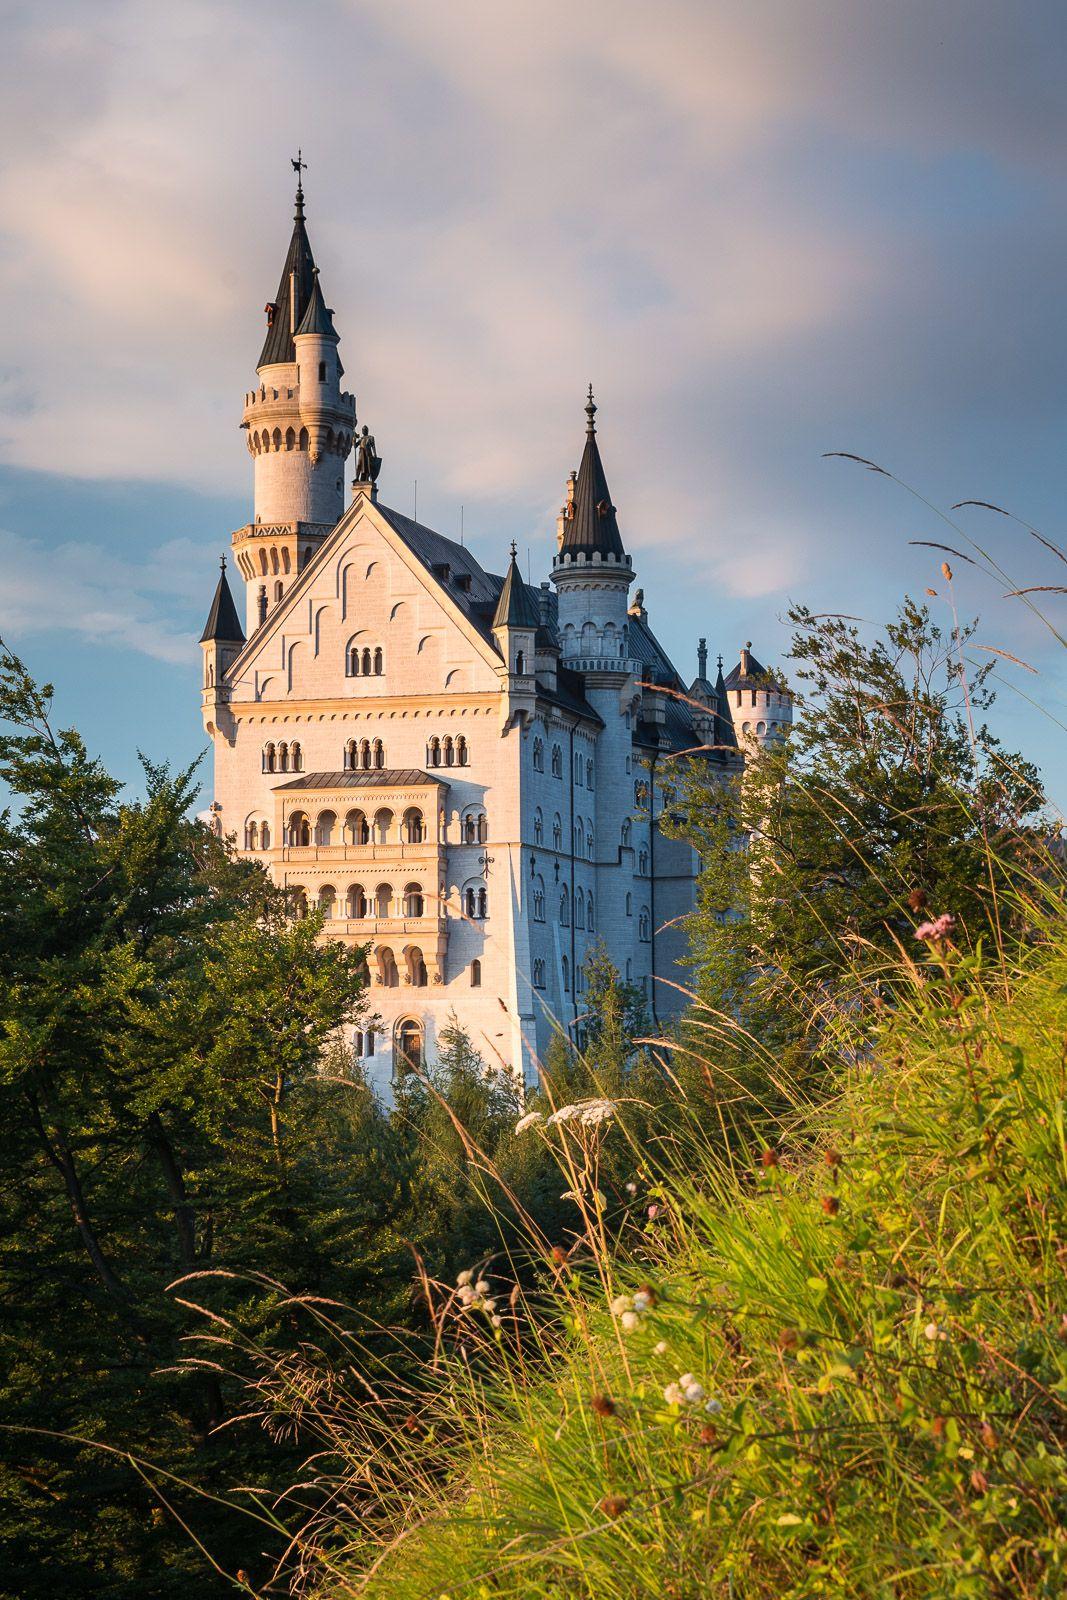 Neuschwanstein Castle Bavaria Germany By Raico Bernardino Rosenberg Neuschwanstein Castle Castle Bavaria Castle